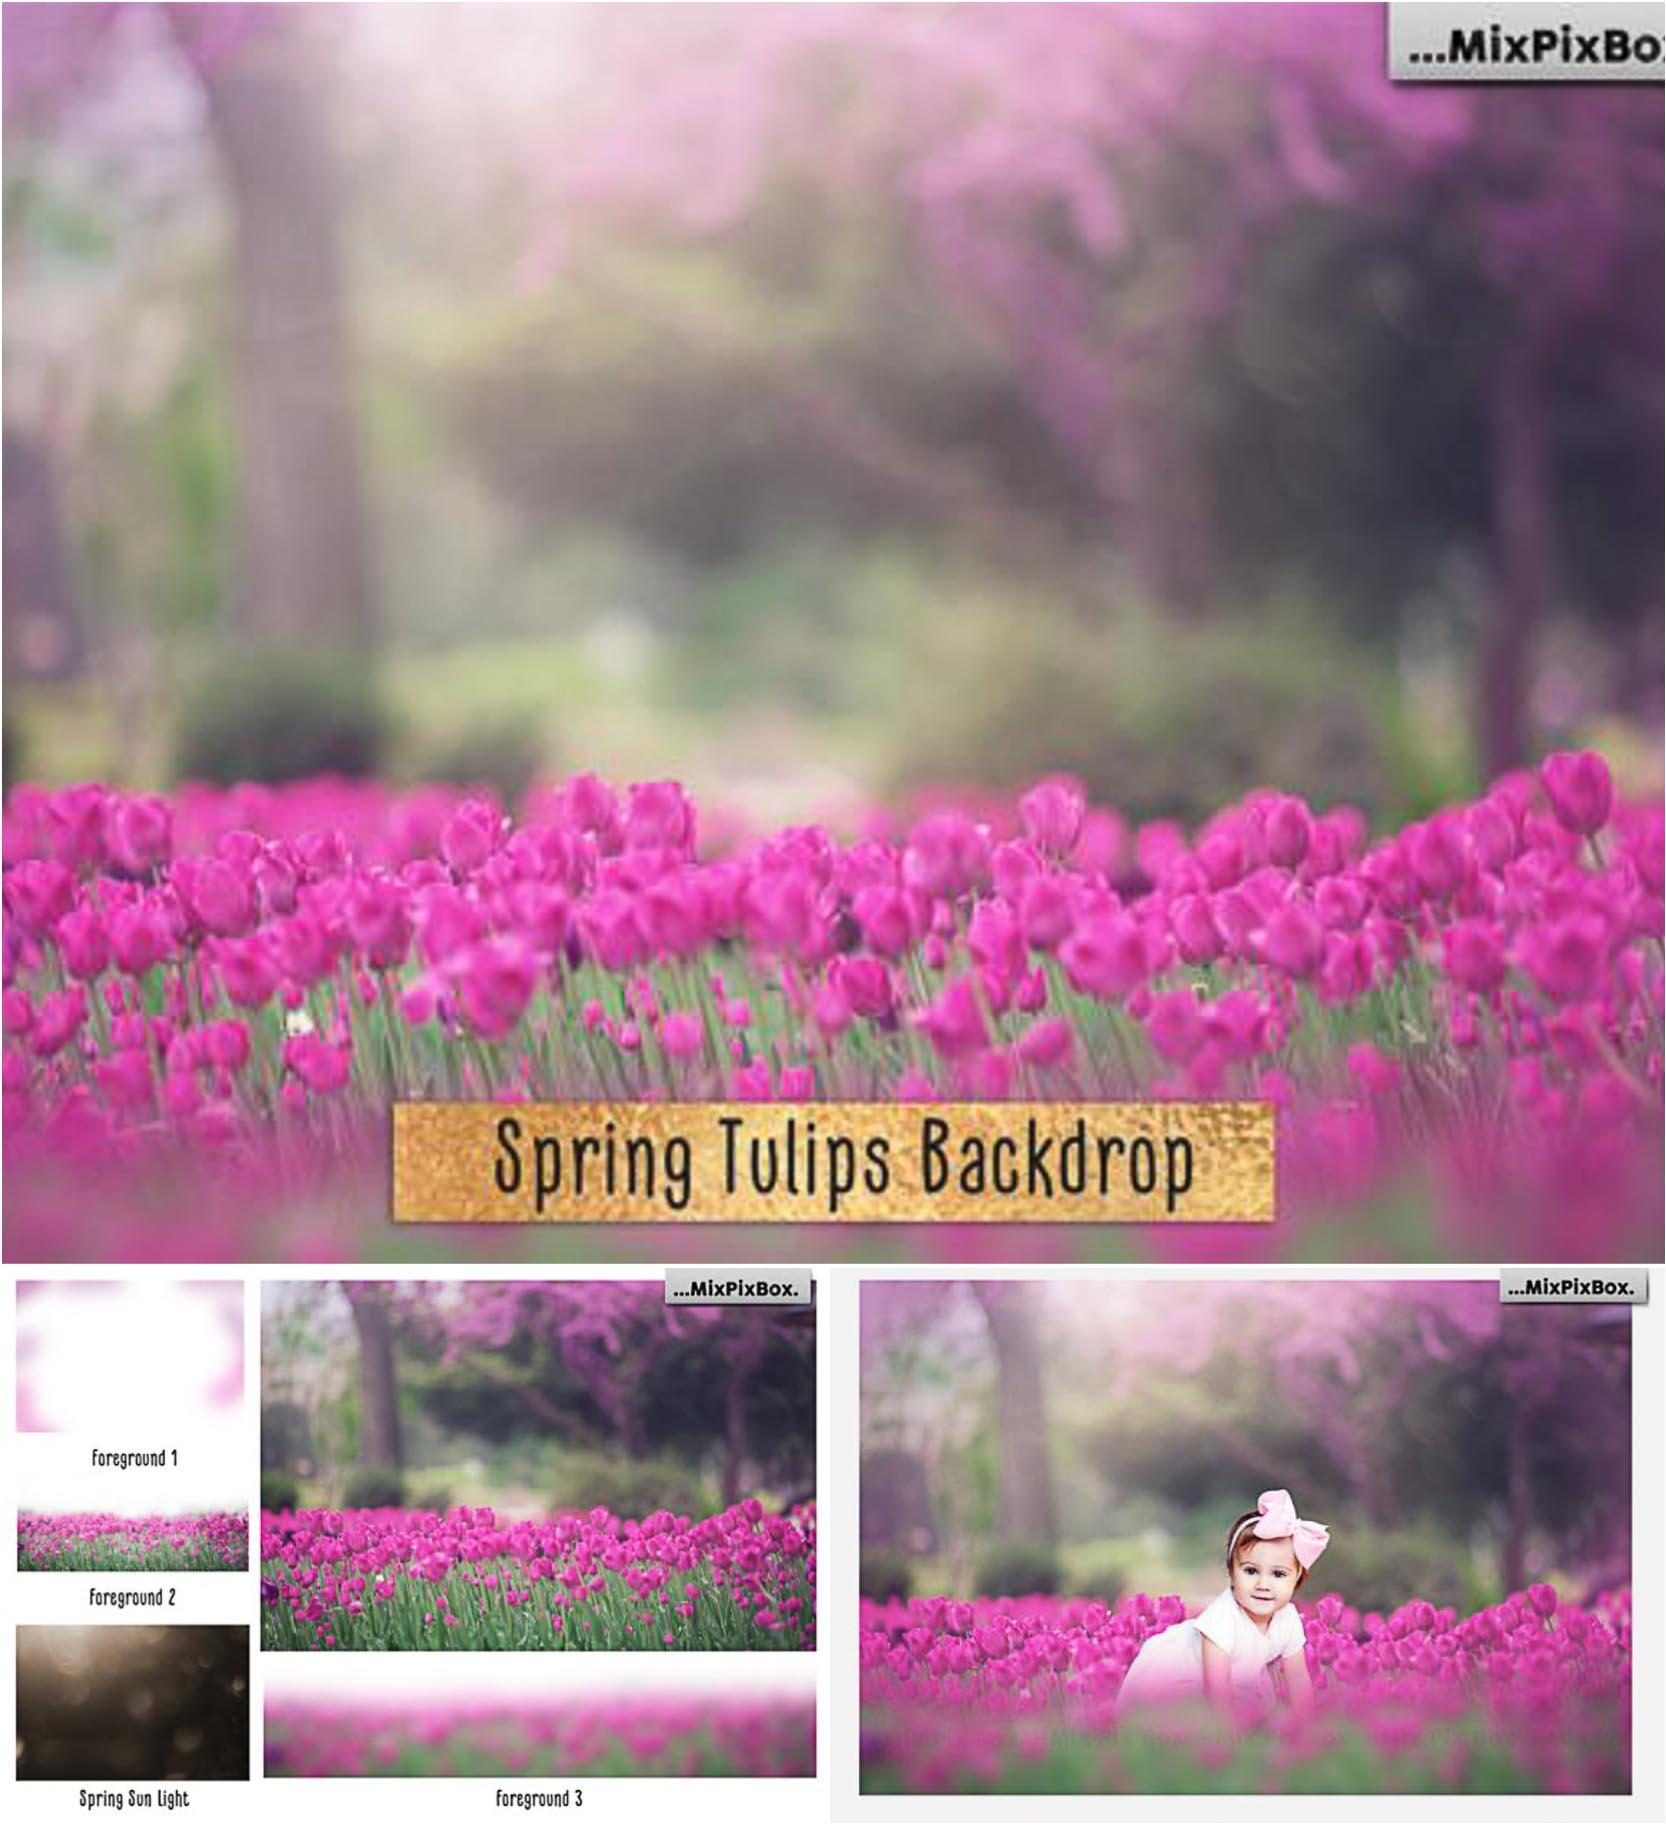 Christmas Kid T Shirt Mock Up: Spring Tulips Backdrop